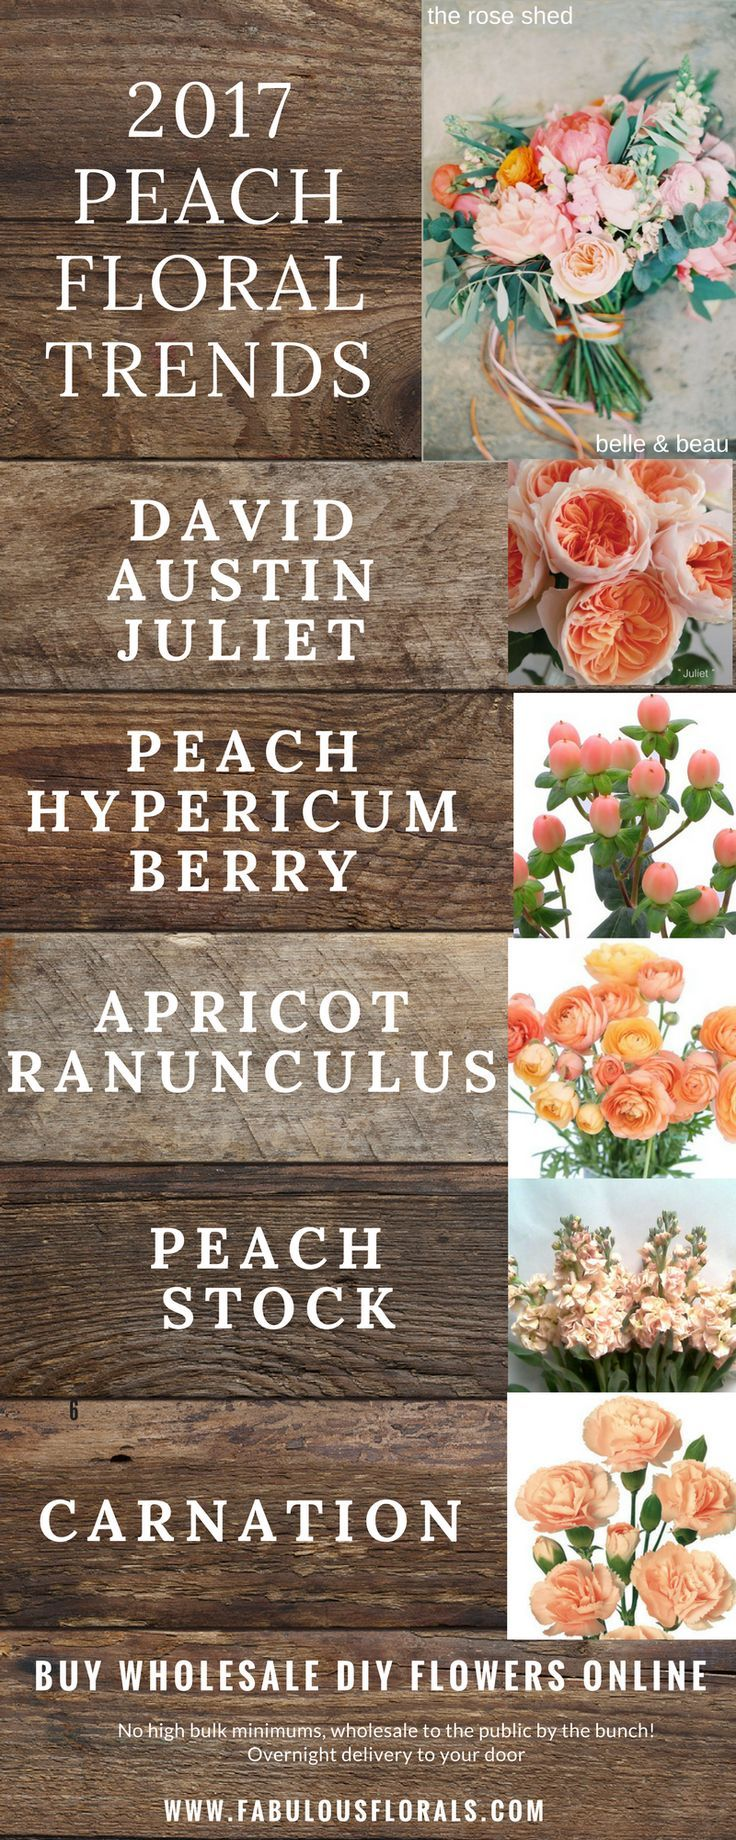 2017 peach wedding flower trends! http://www.fabulousflorals.com The DIY bride's #1…